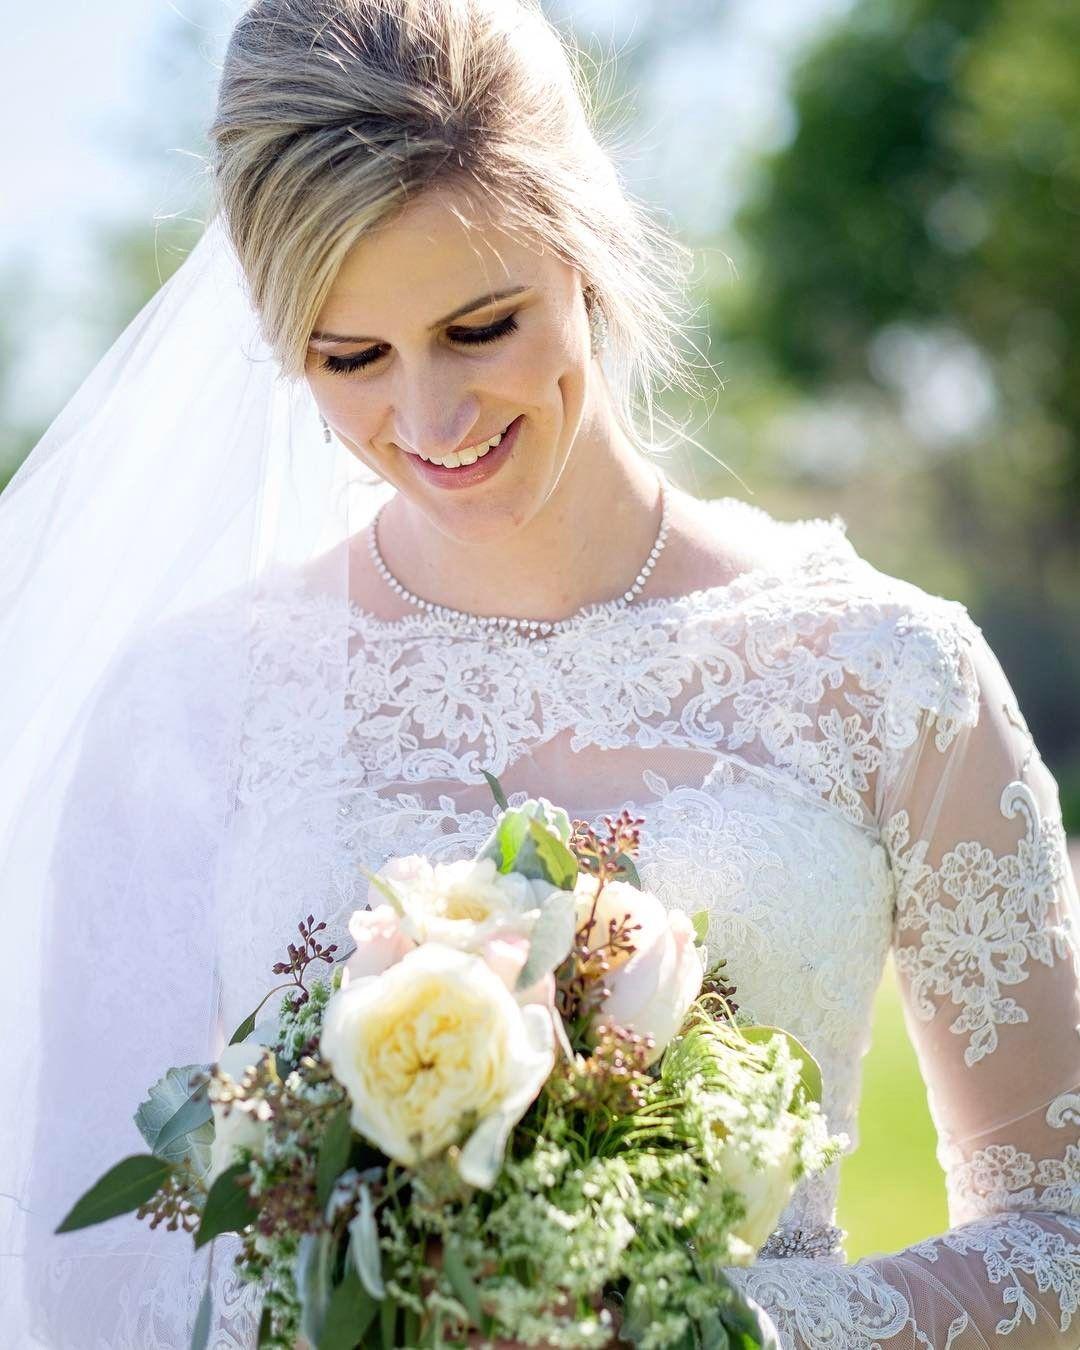 Beauty.  #bride #wedding #marriage #weddingmoments #weddingphotographer #weddingday #weddingphotojournalism #weddingphotography #montrealphotographer #mtlwedding #montrealweddingphotographer #mtlphotographer #albuquerque #abqwedding #abqphotographer #instawedding